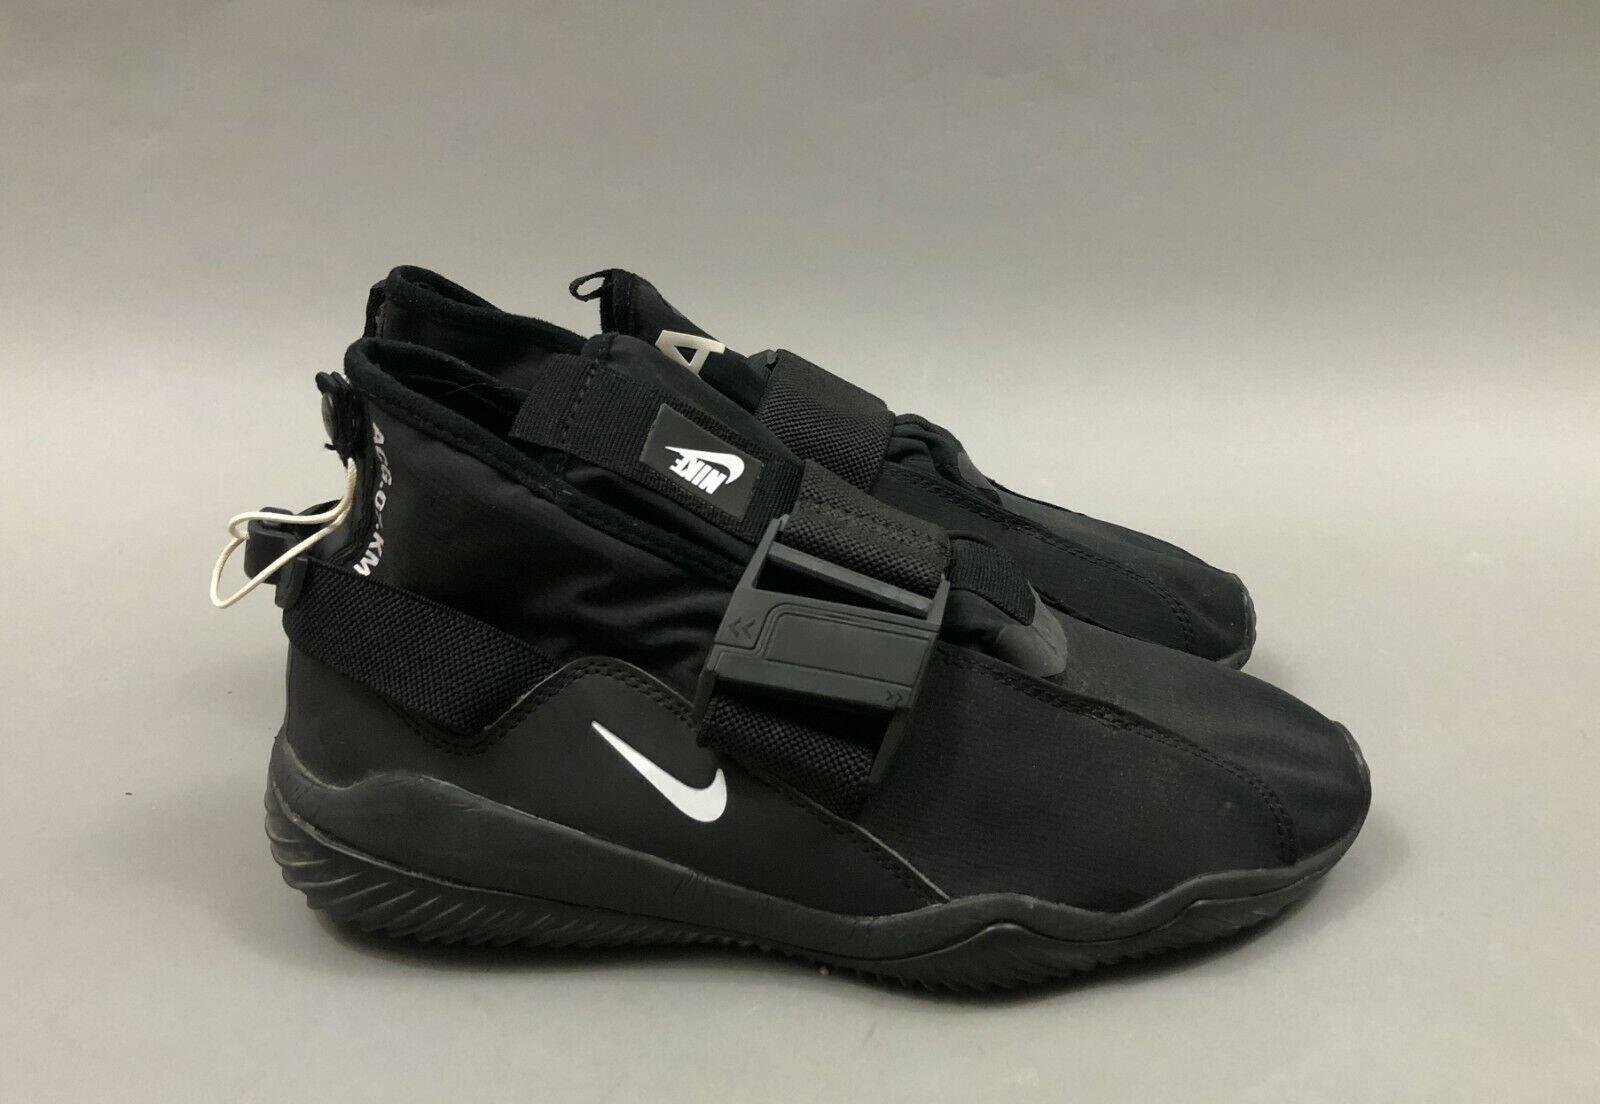 Algebraico persona que practica jogging tierra  Nike Nike Sneakers Nikelab Acg Shoes 07 Kmtr Komyuter 42   Grailed